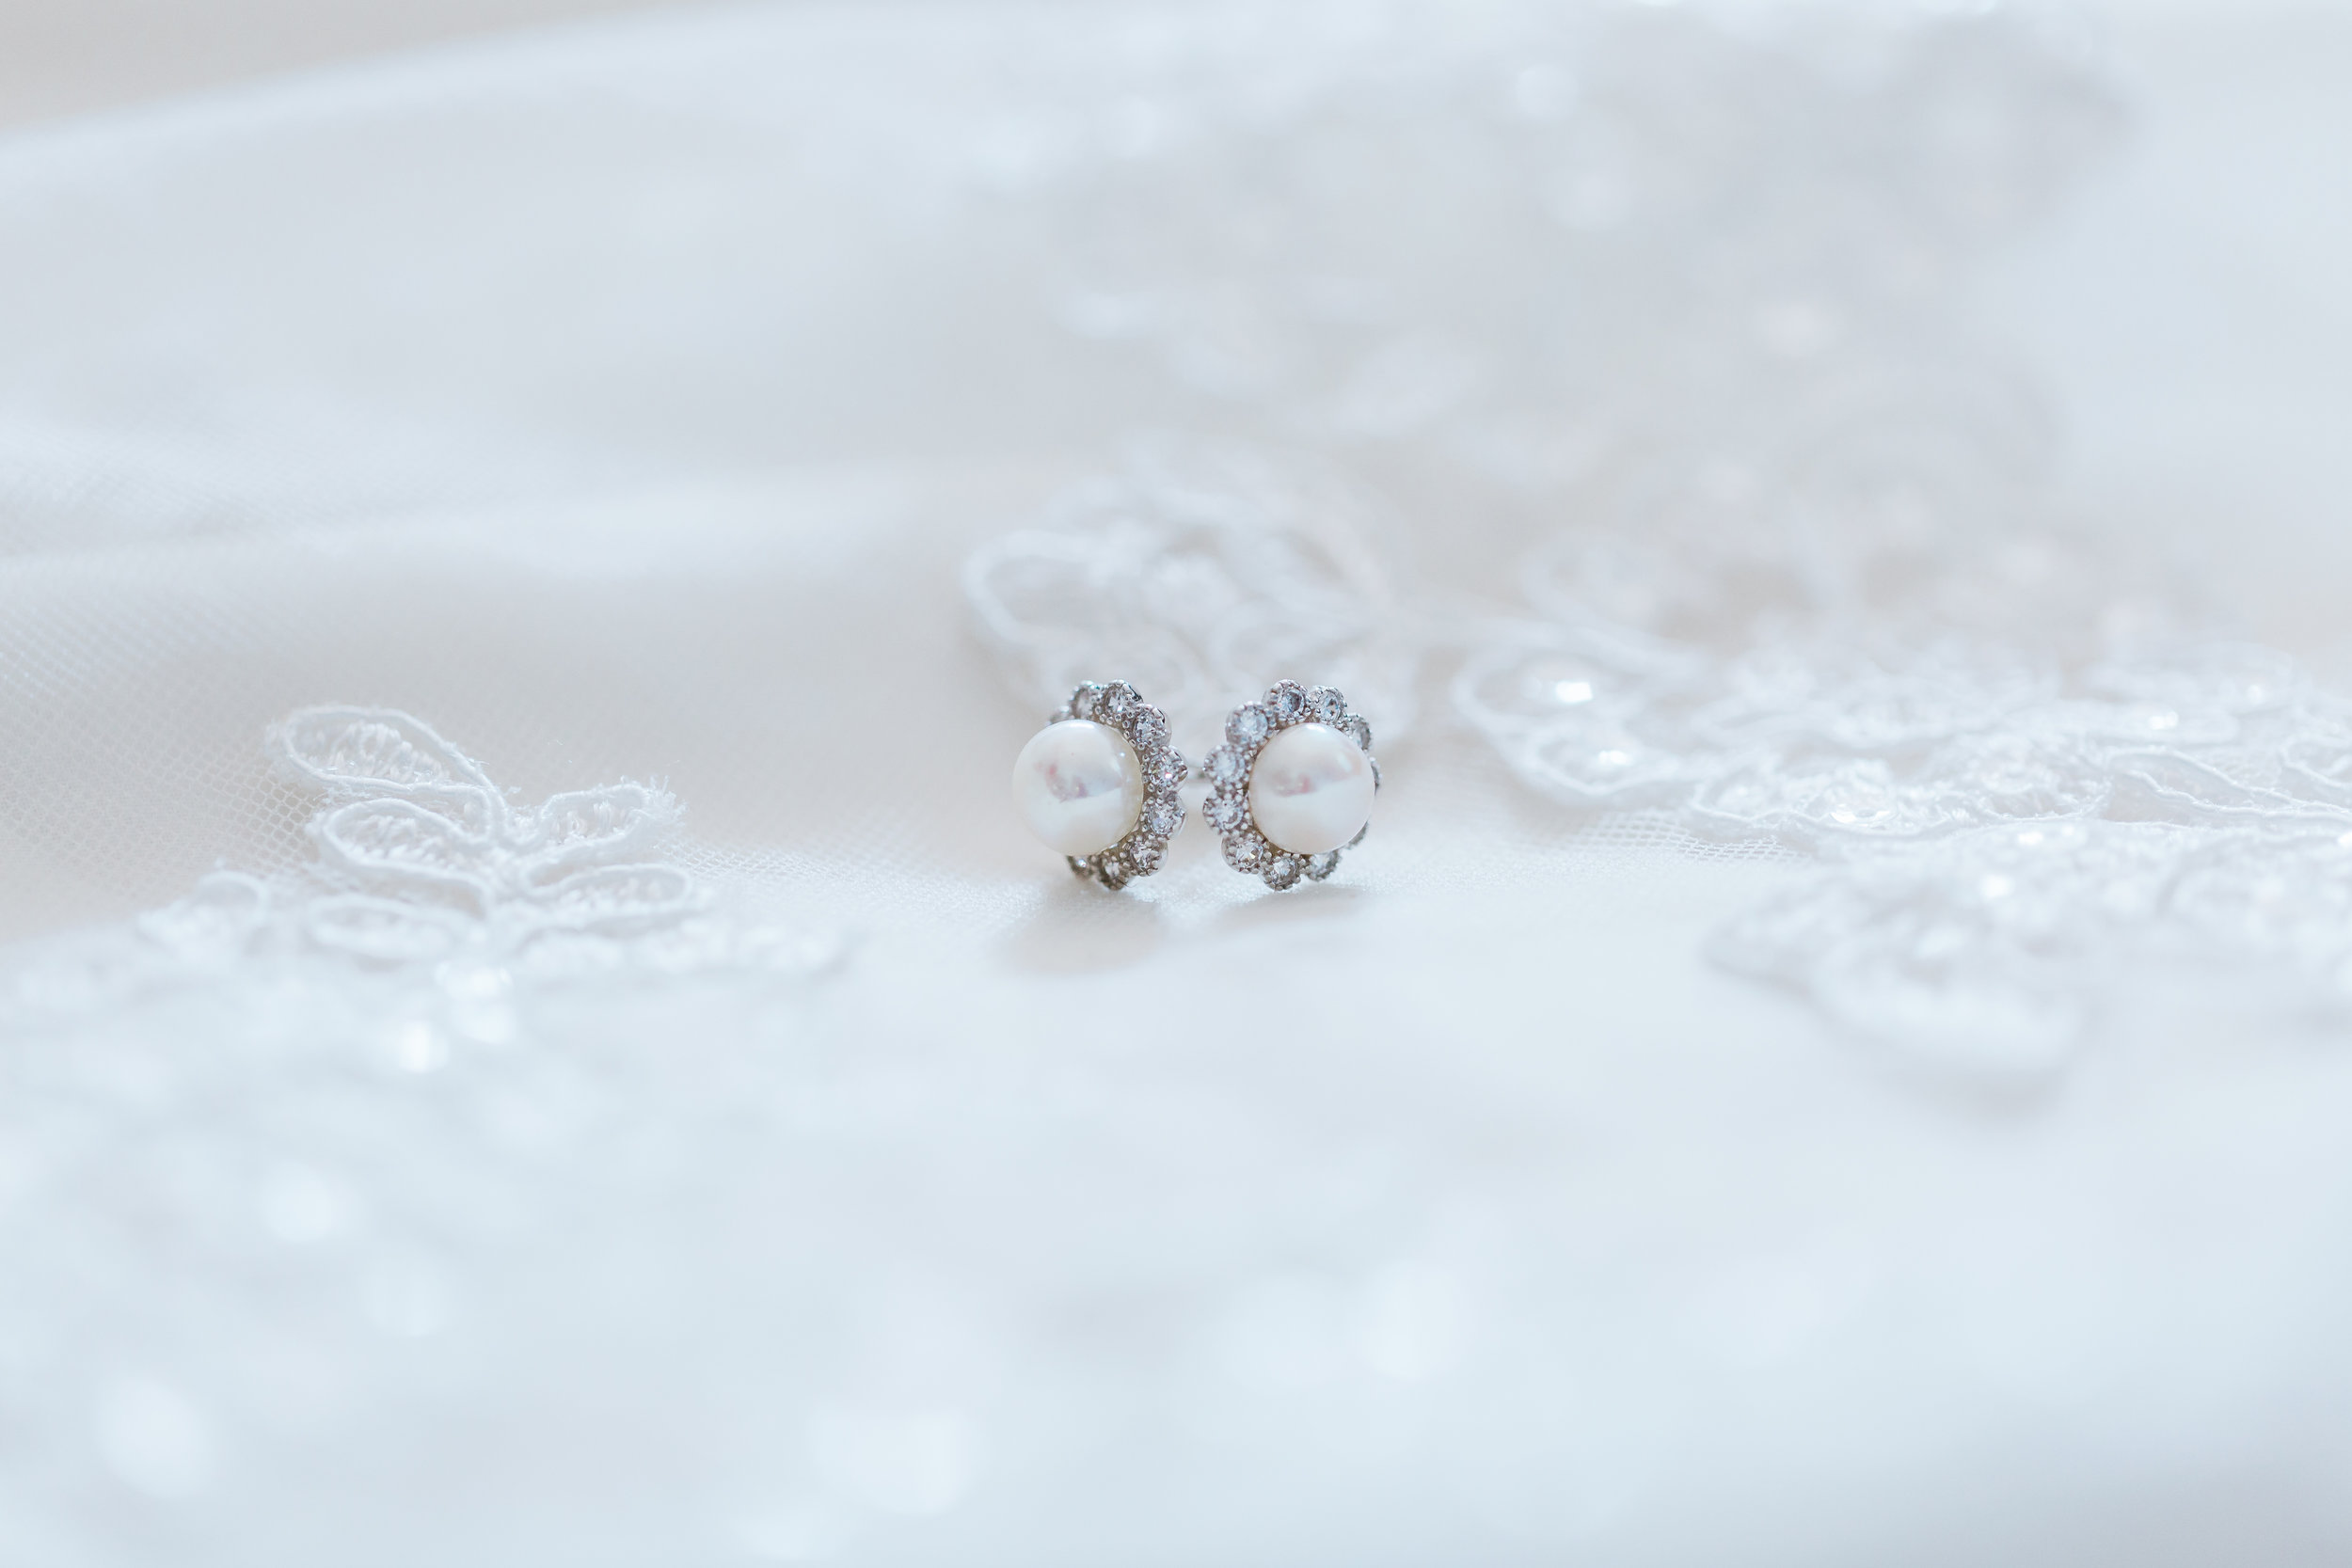 maryland bridal details - pearl bride earrings - best maryland wedding photographer